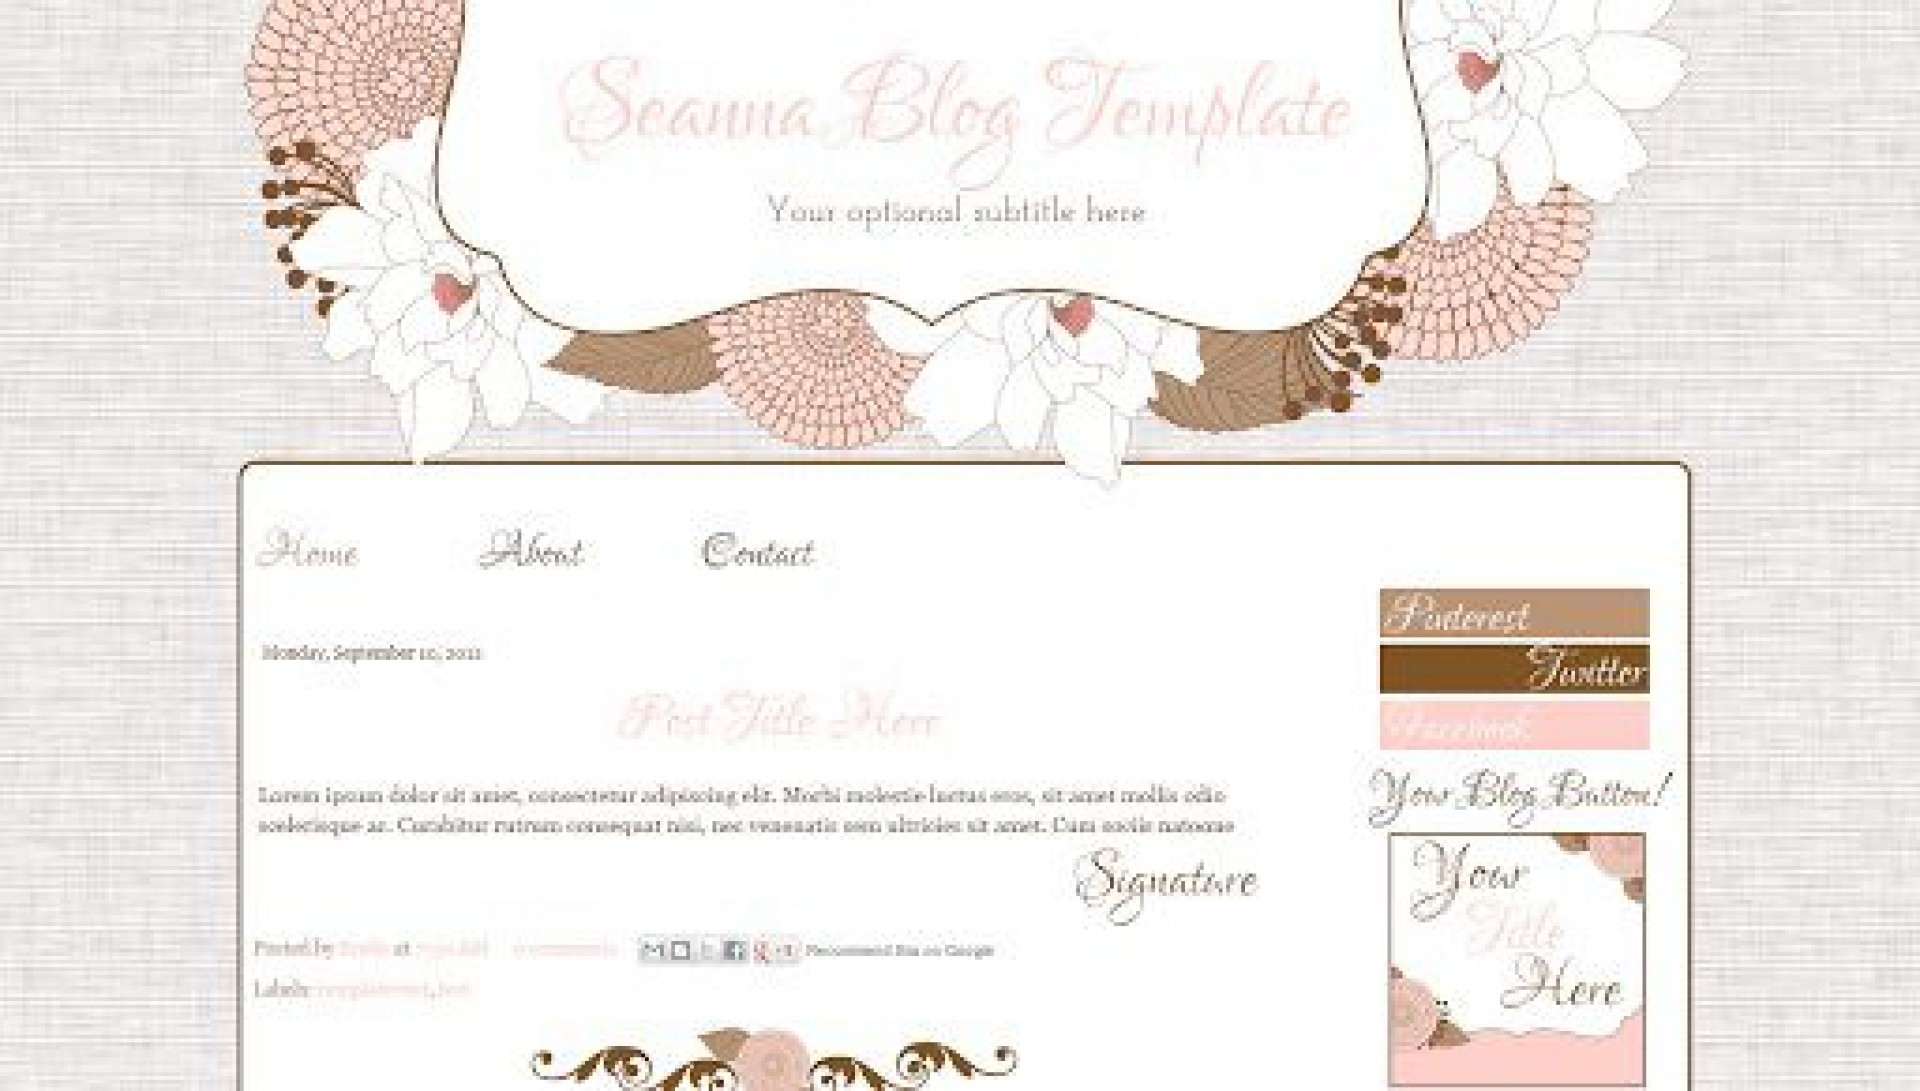 009 Impressive Free Cute Blogger Template Concept  Templates1920